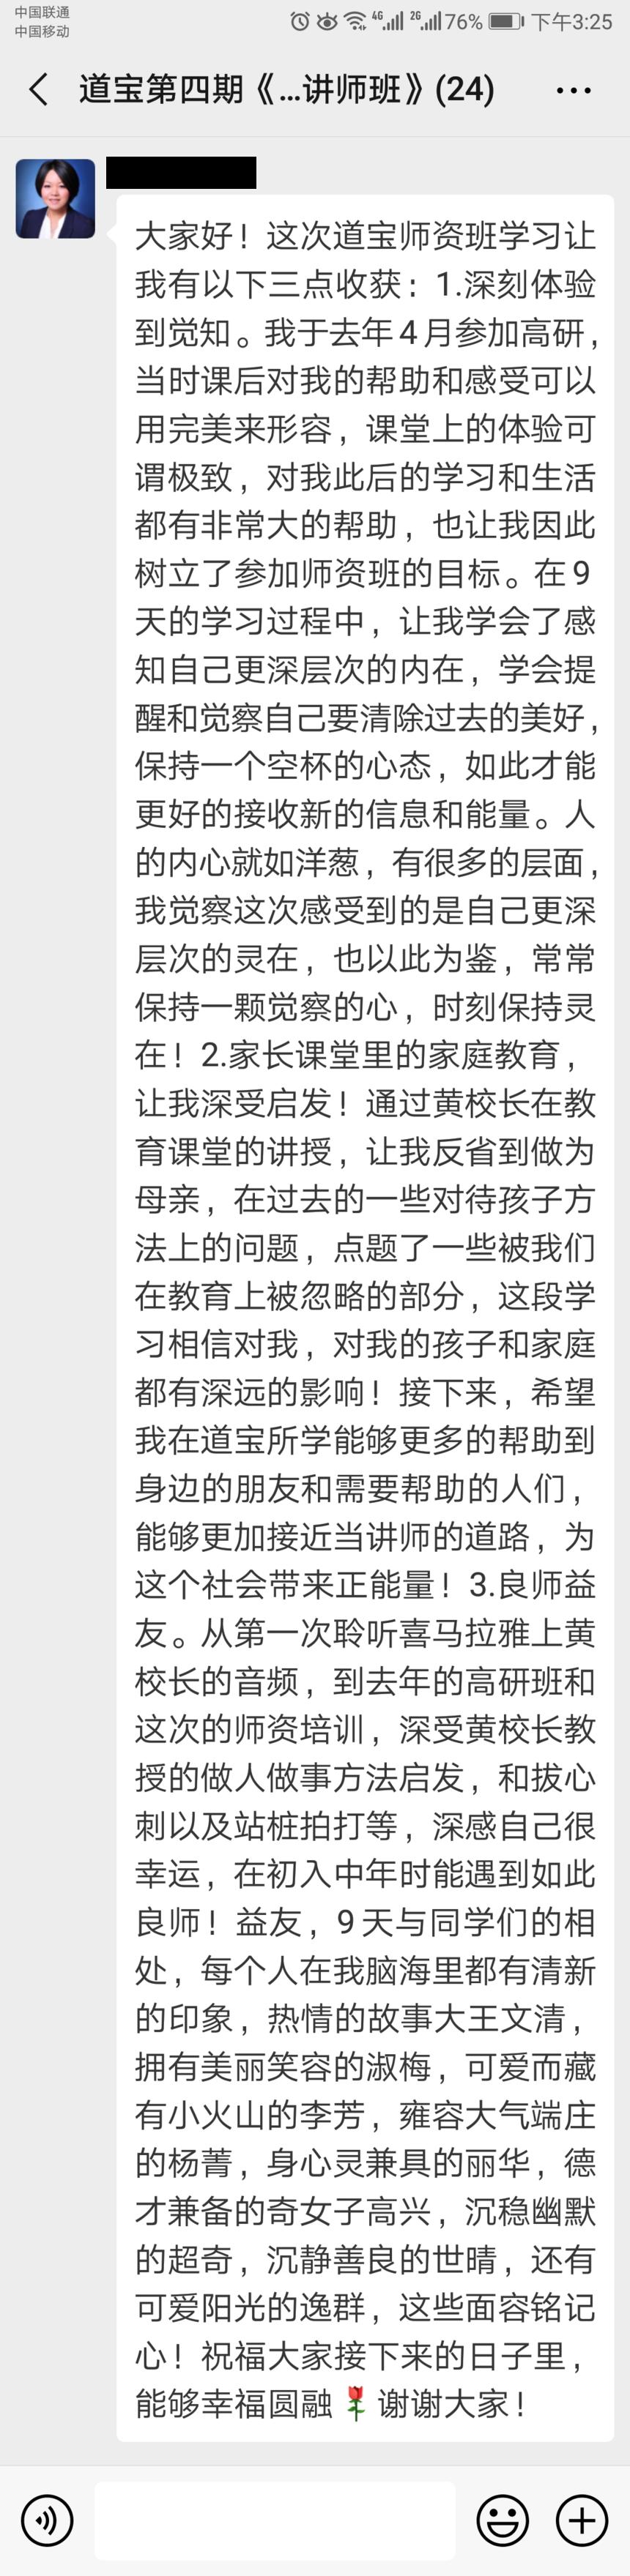 Screenshot_2019-04-08-15-25-30.png